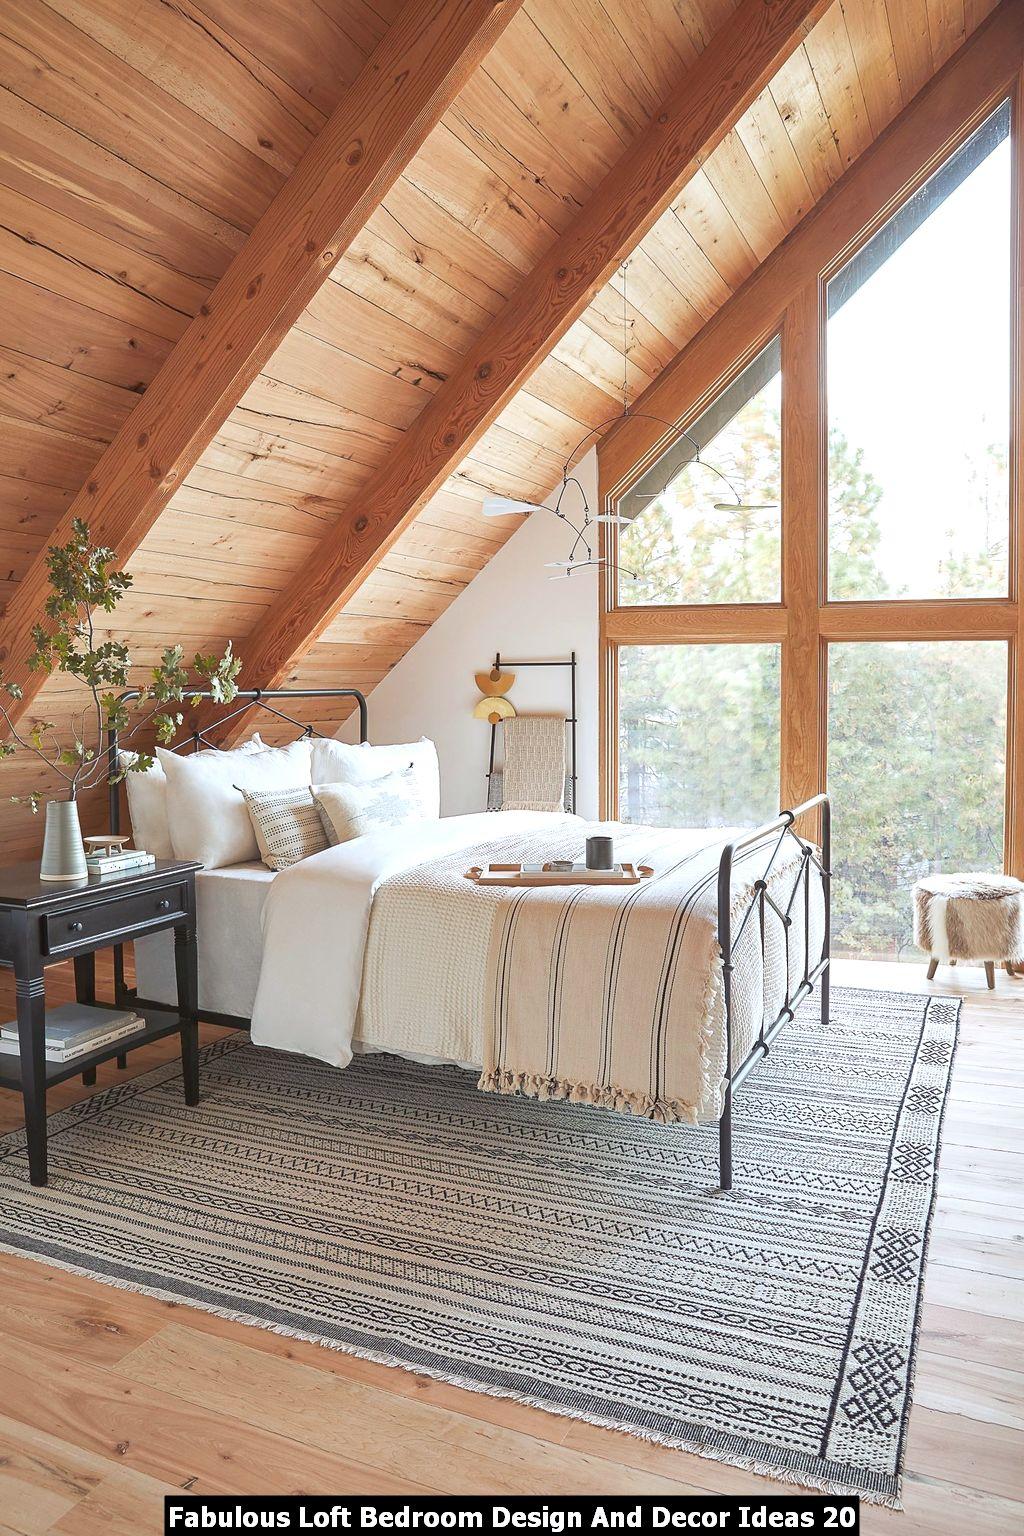 Fabulous Loft Bedroom Design And Decor Ideas 20